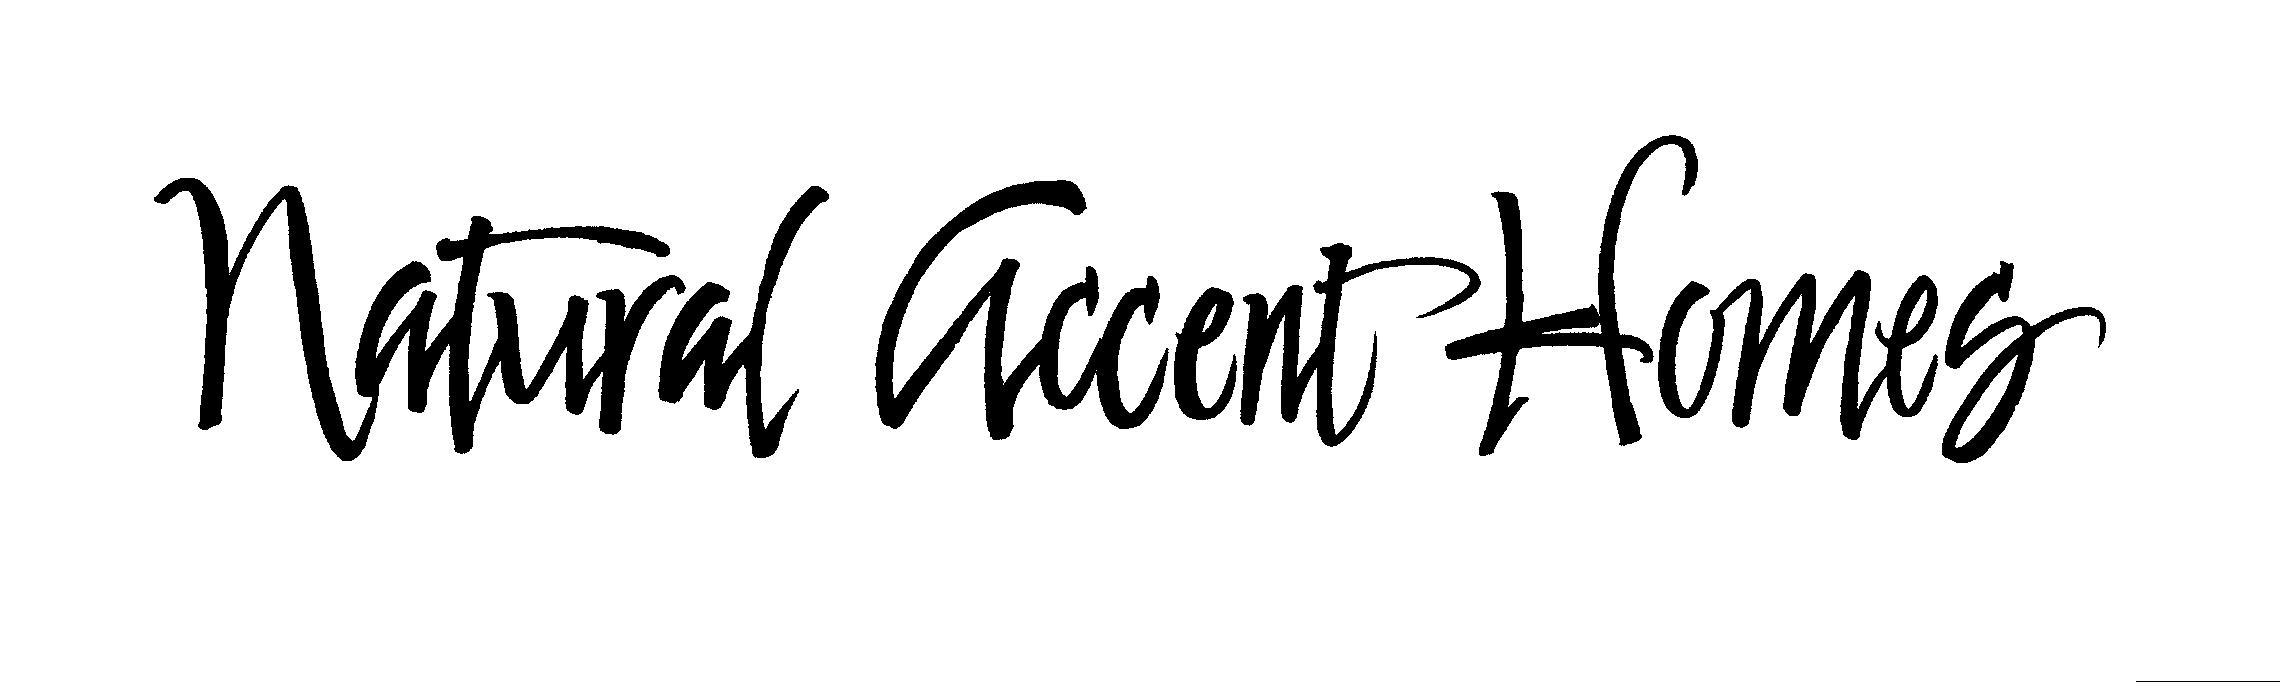 natural accent homes logo jpg